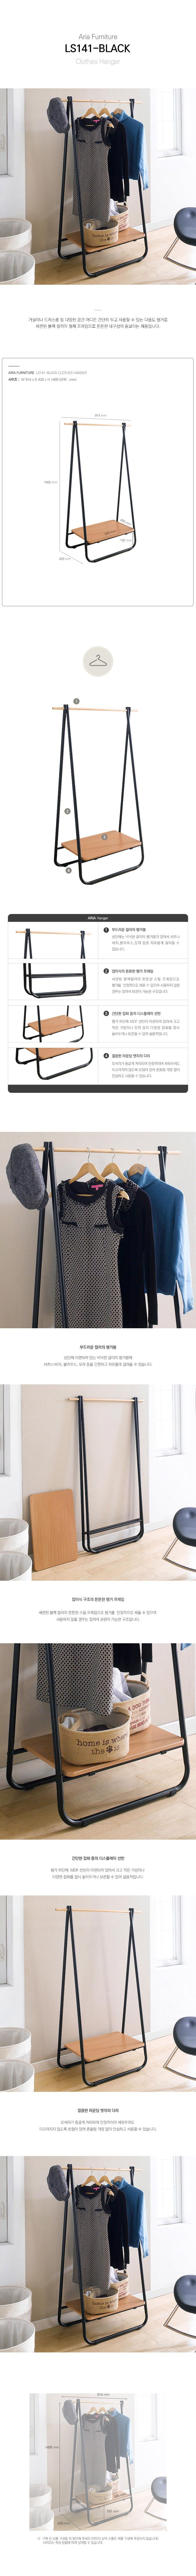 10_04_LS141_Clothes_hanger.jpg